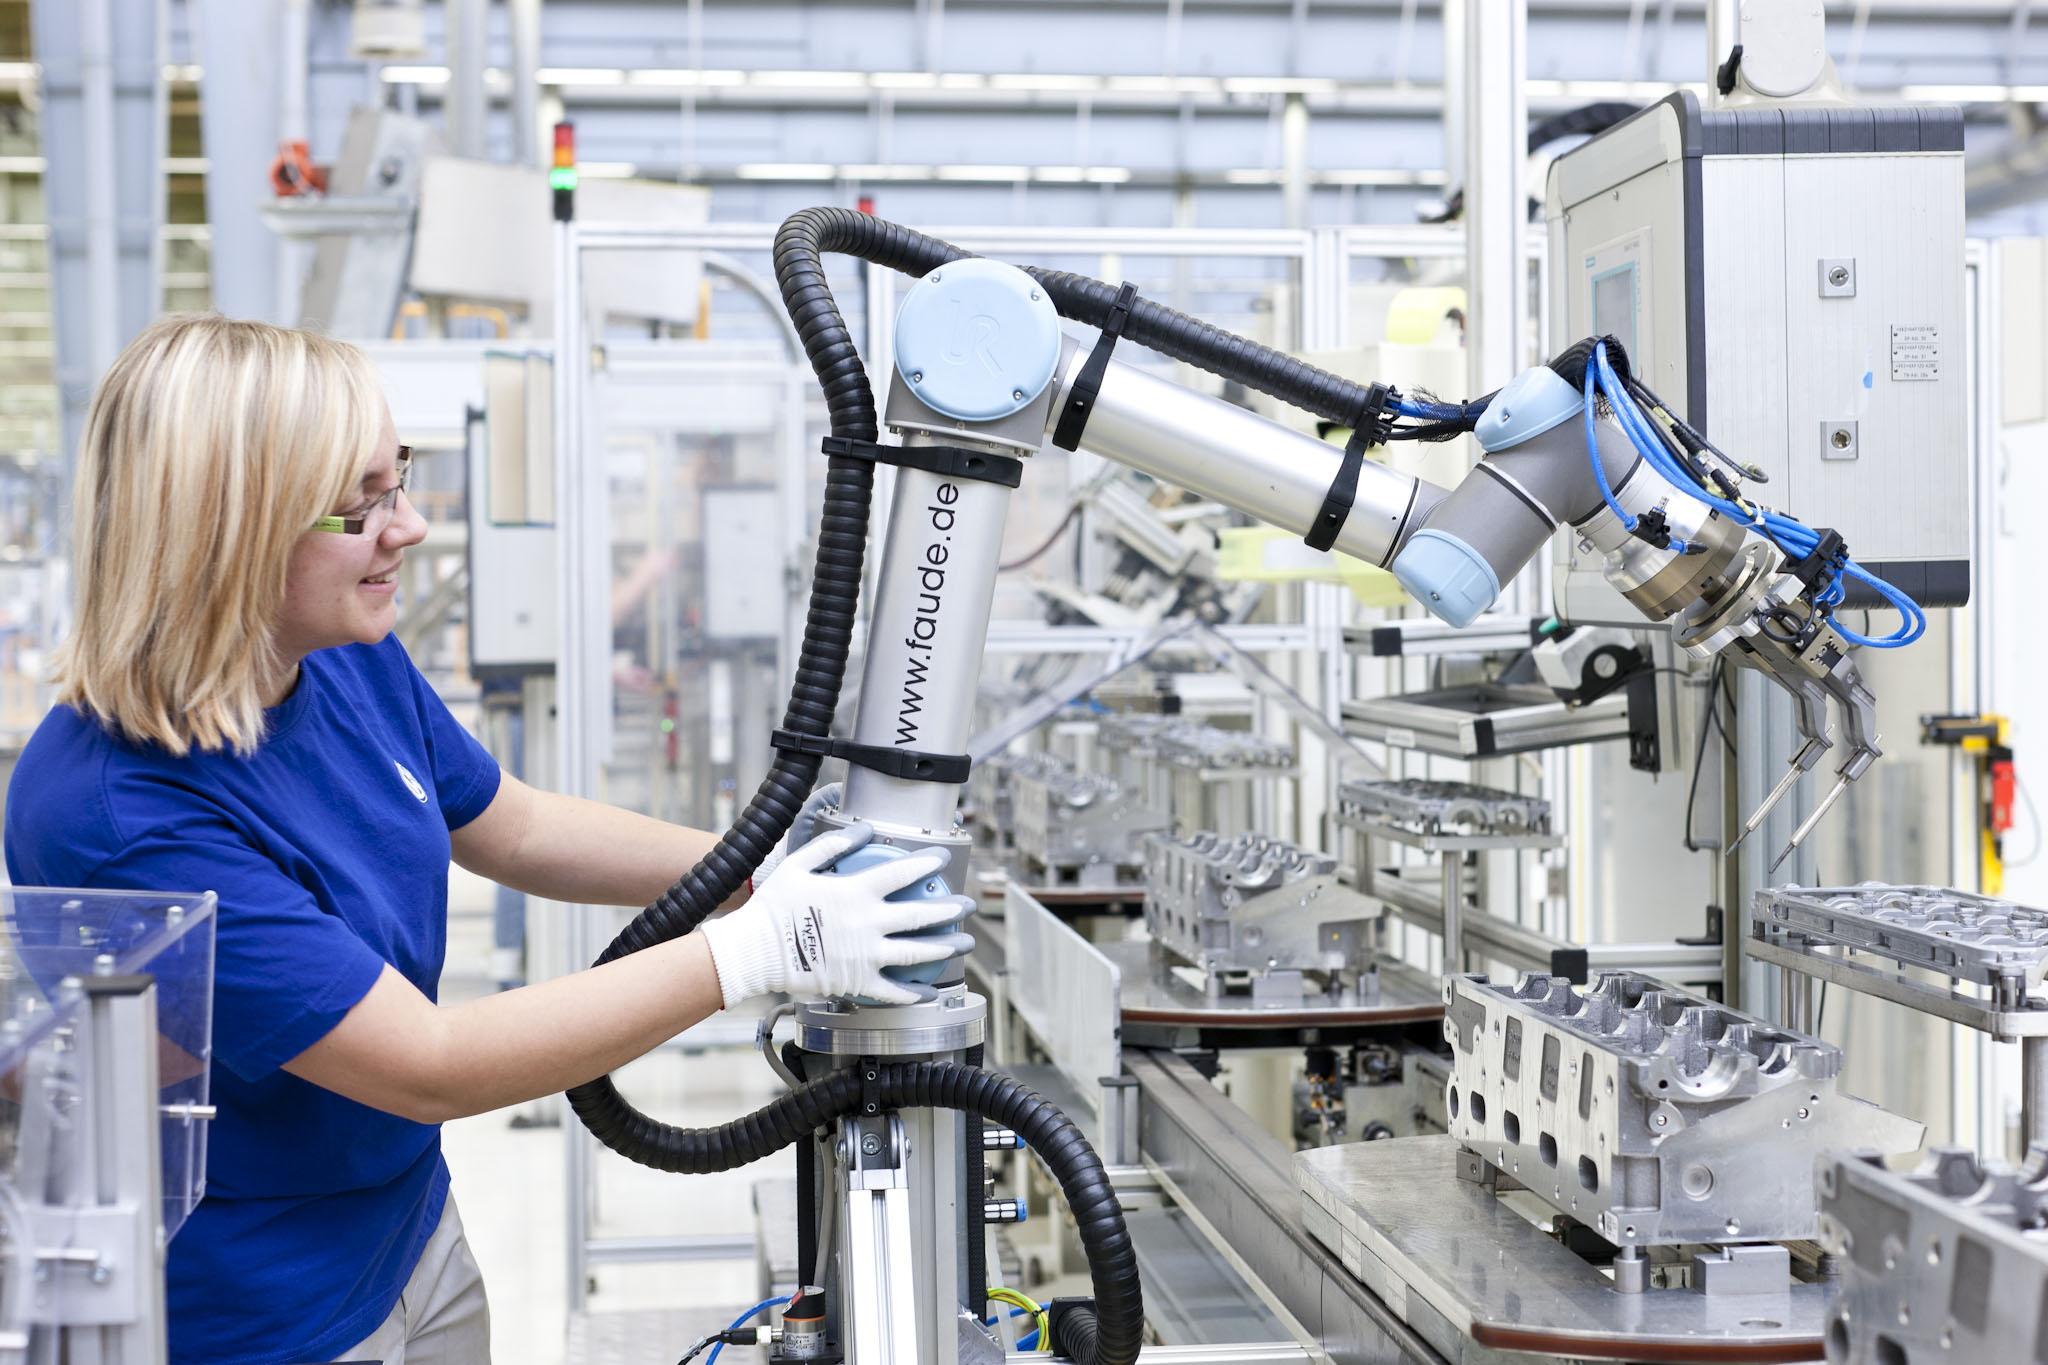 UR5 robot in a firm